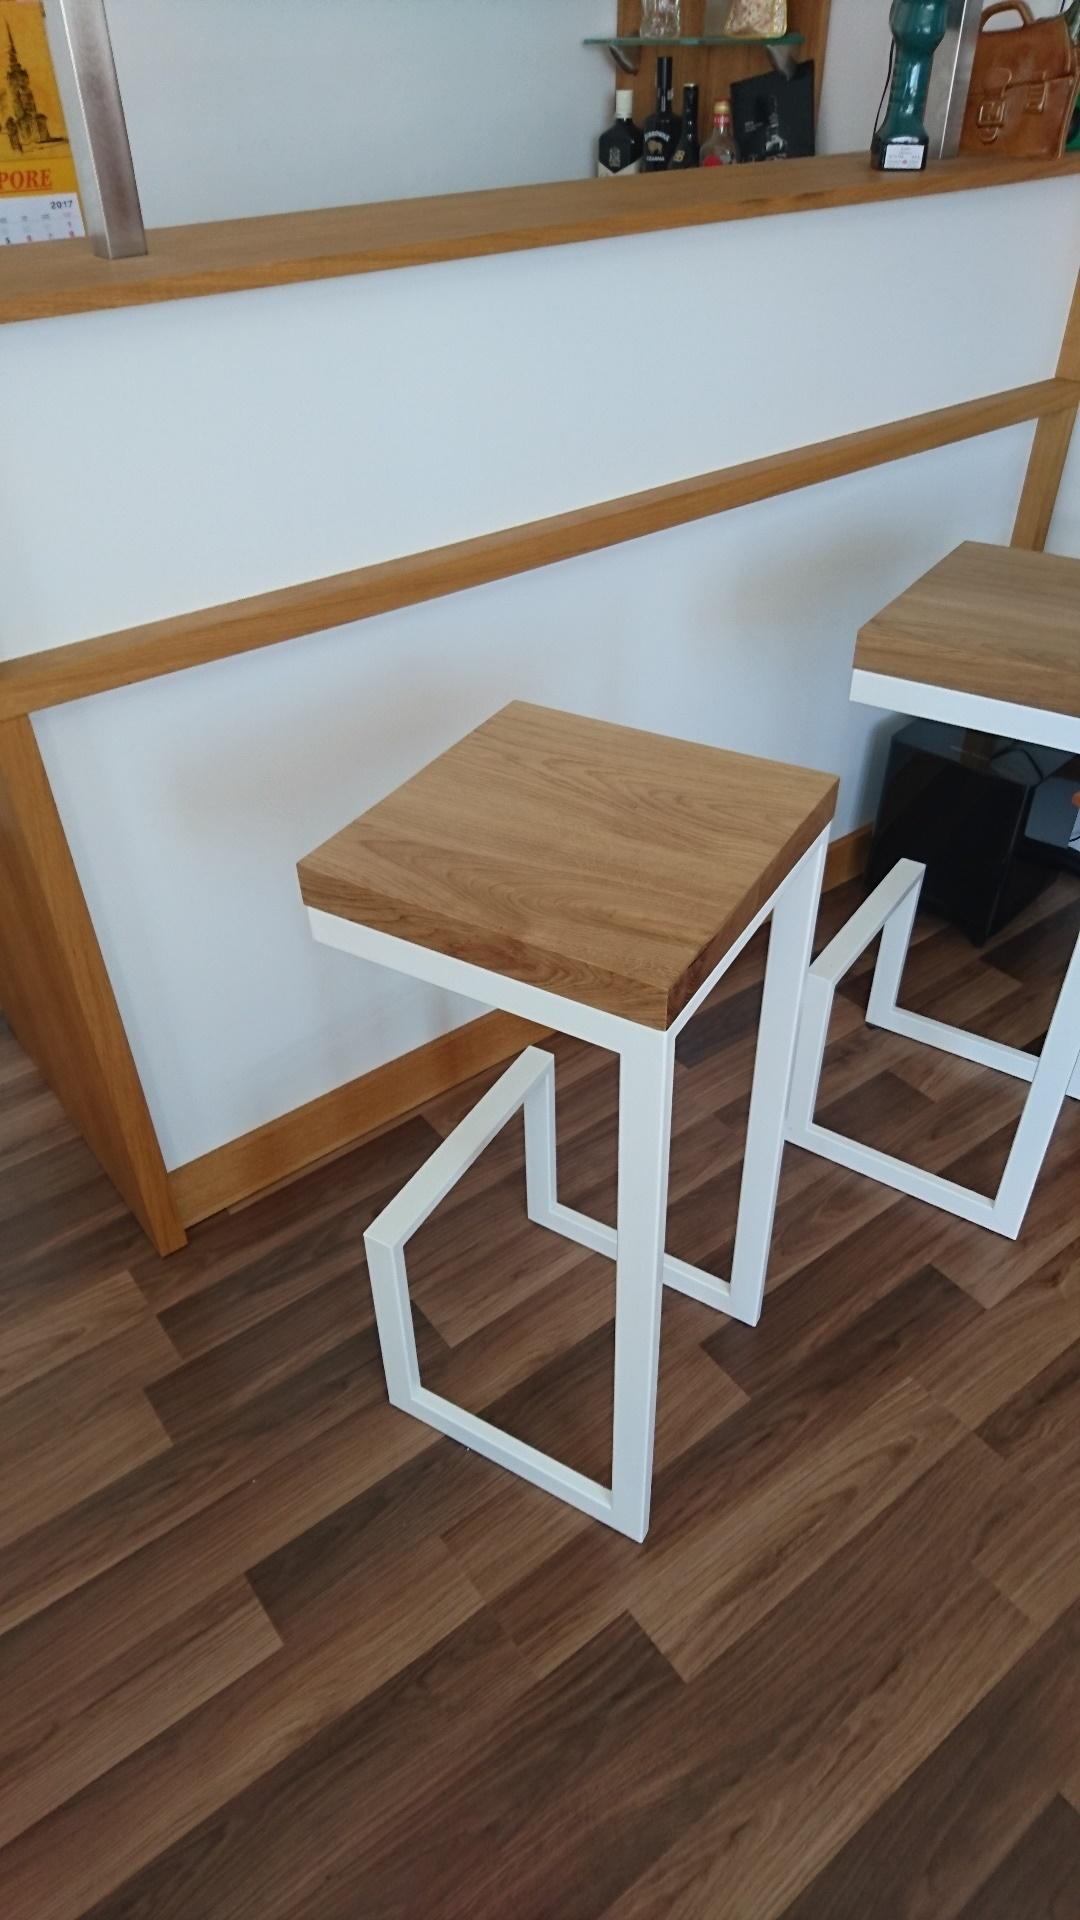 barhocker aus holz und metall. Black Bedroom Furniture Sets. Home Design Ideas